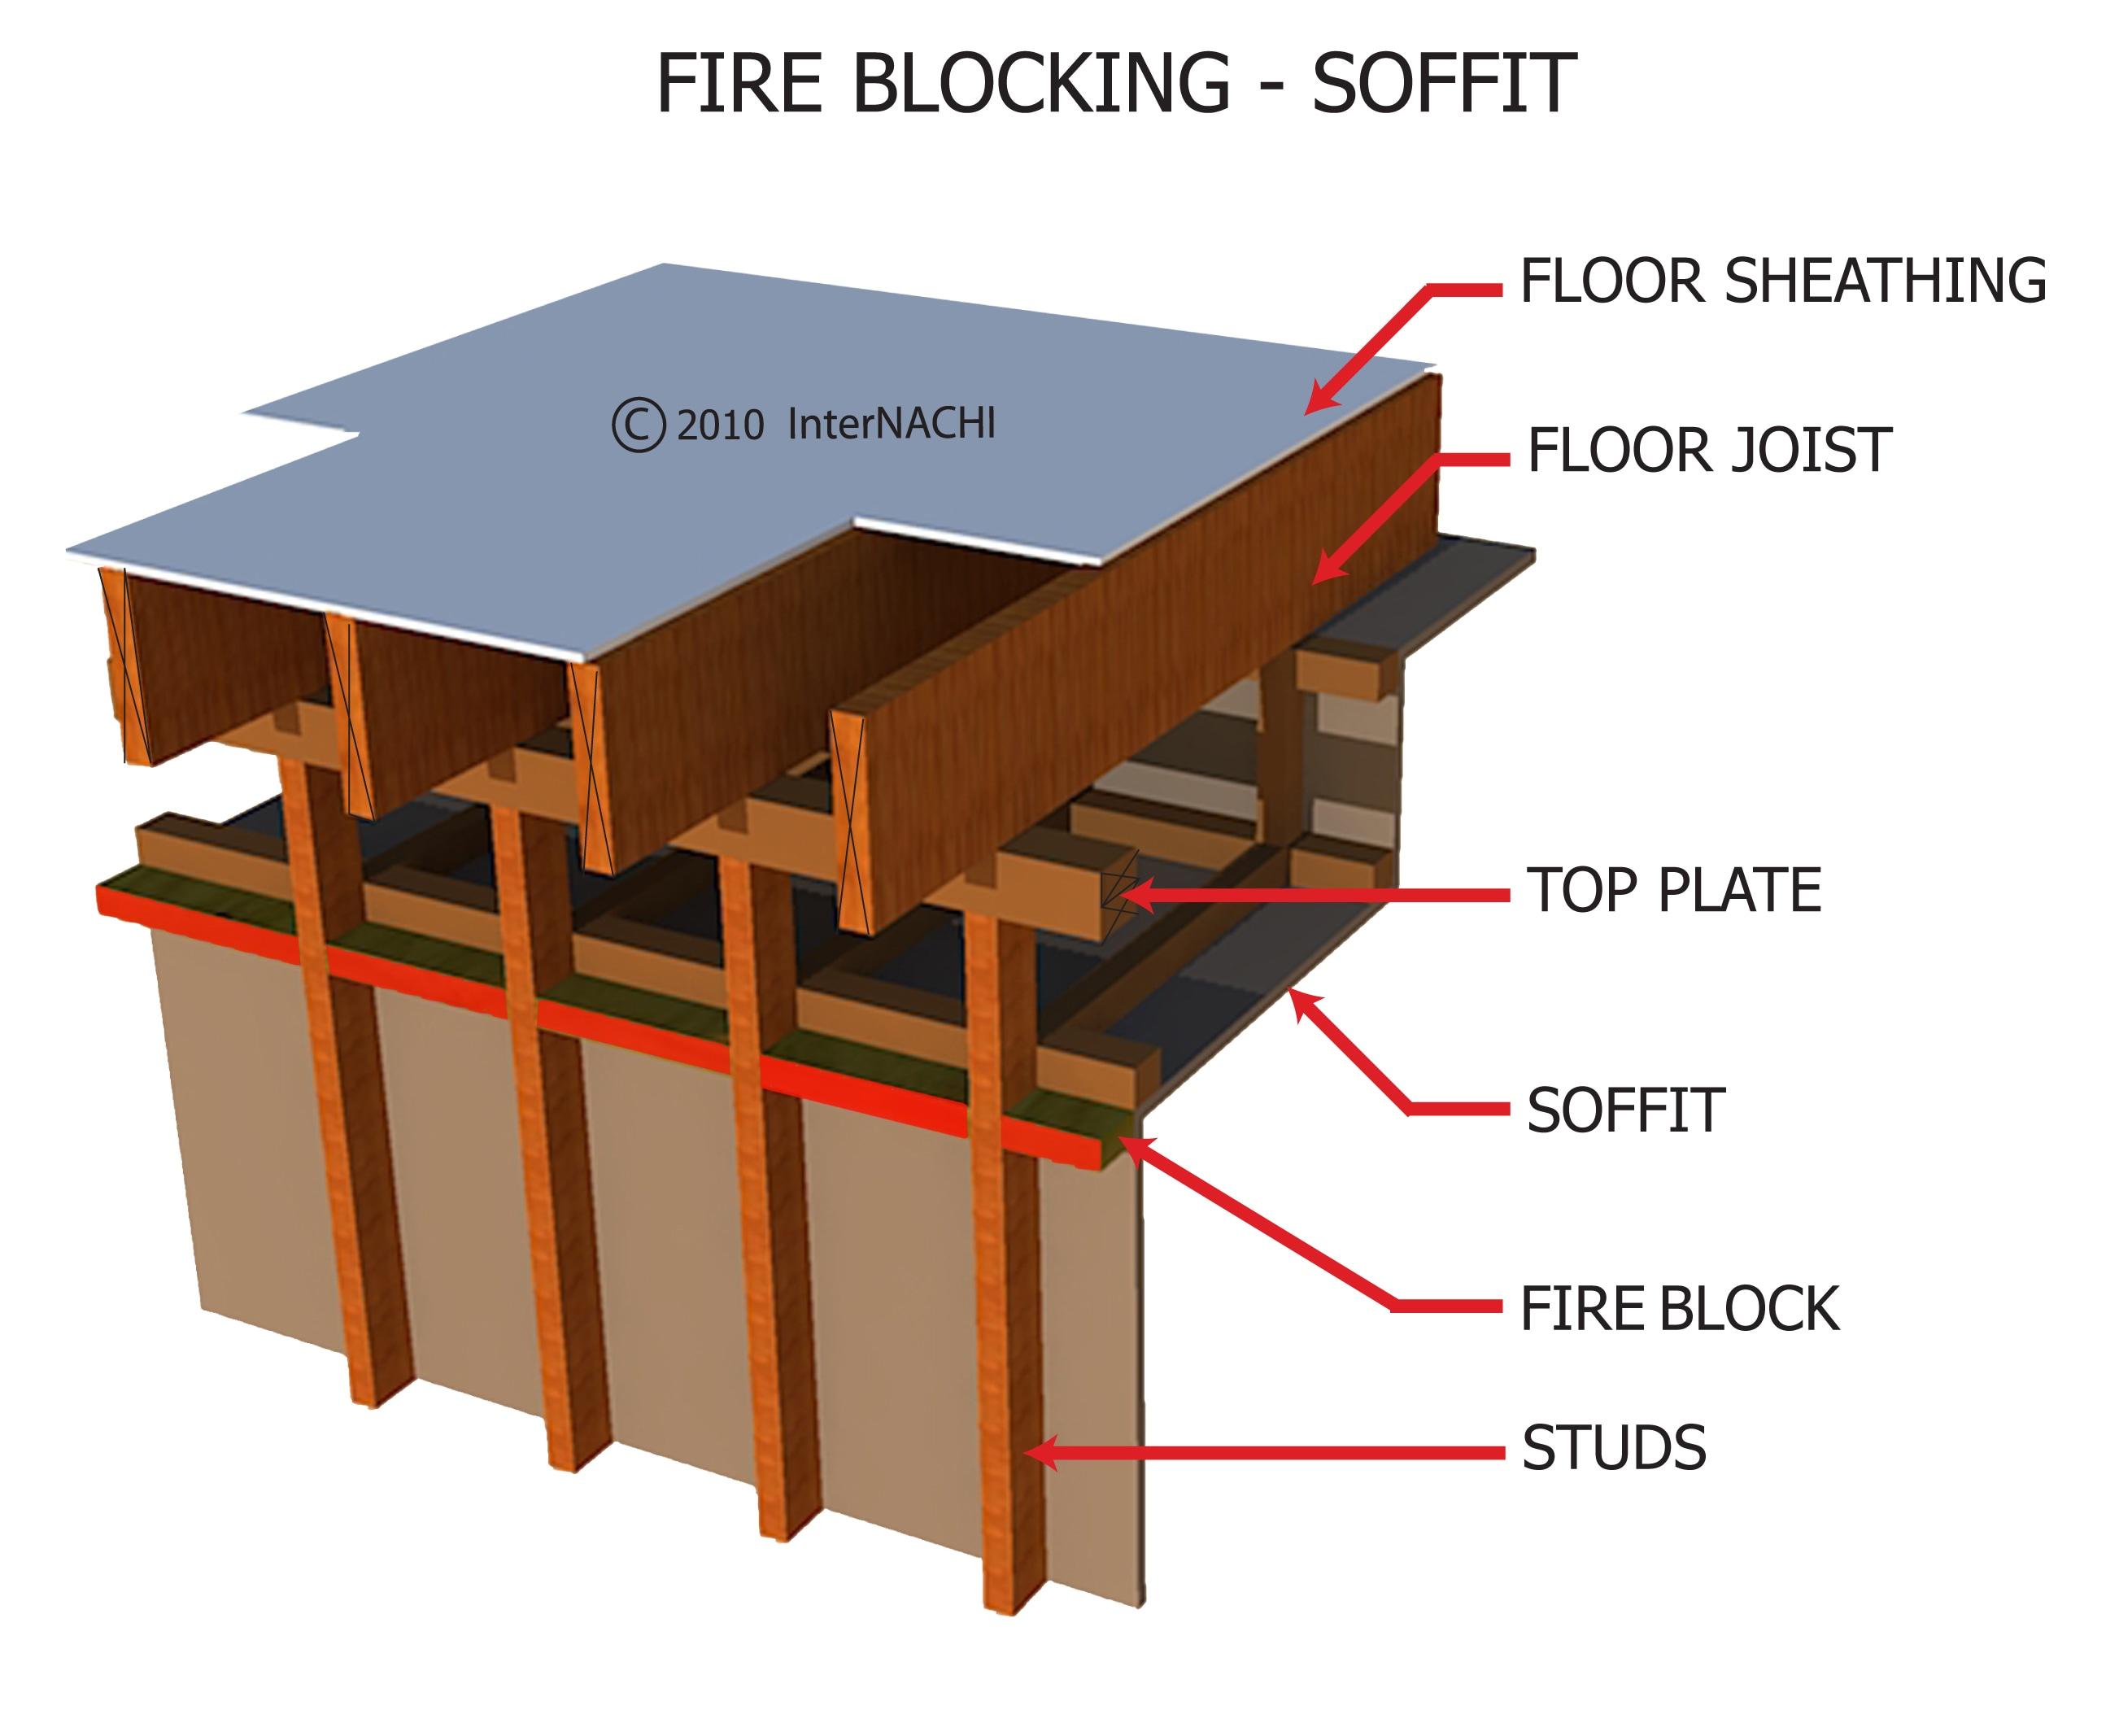 Fire Blocking - Soffit